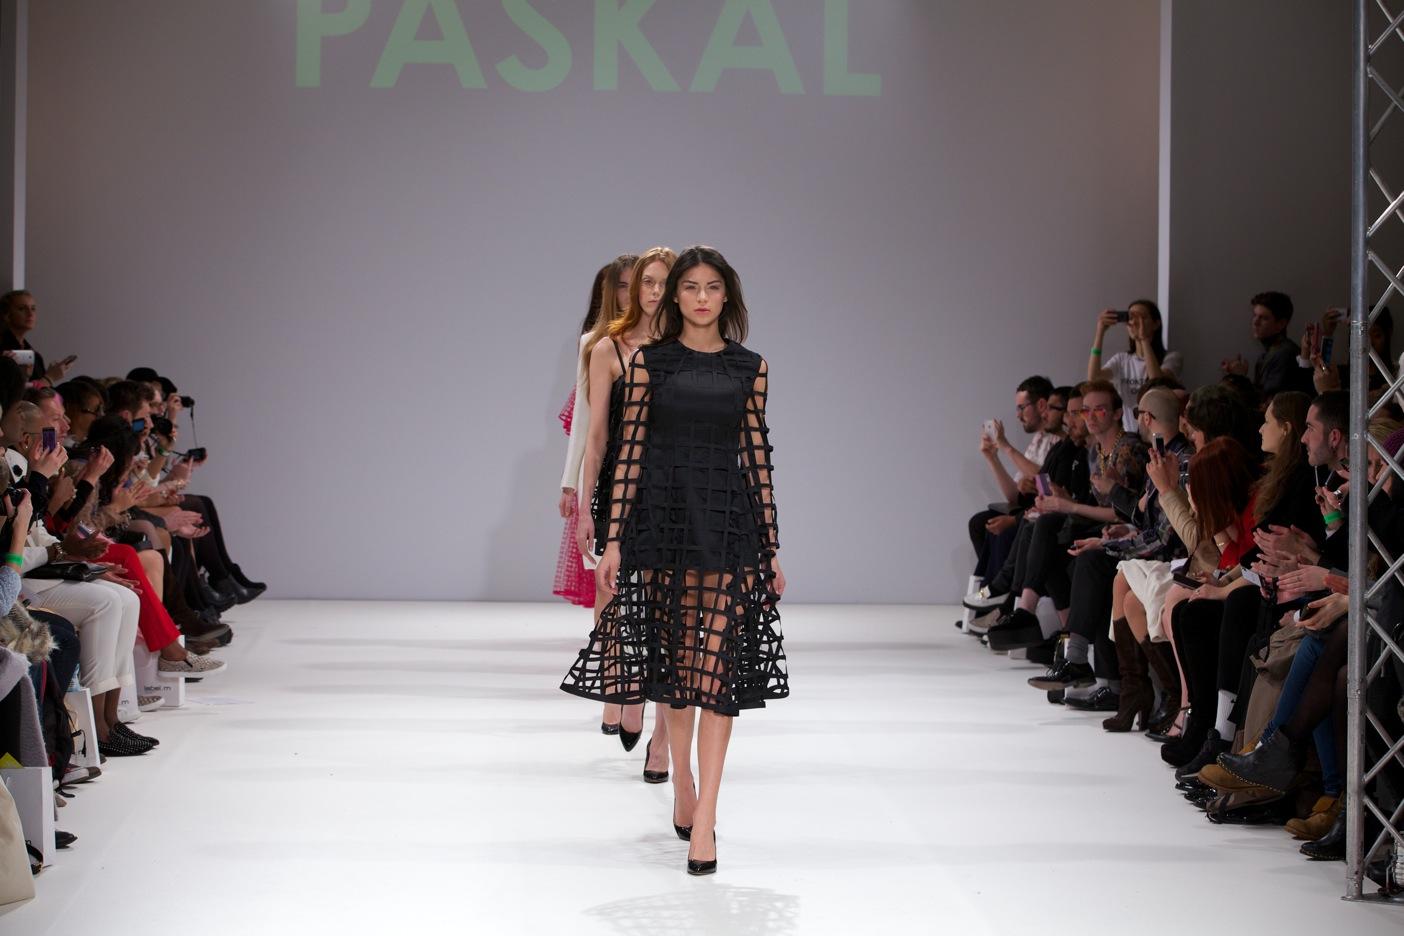 Kiev Fashion Days A-W 2014 (c) Marc aitken 2014  44.jpg